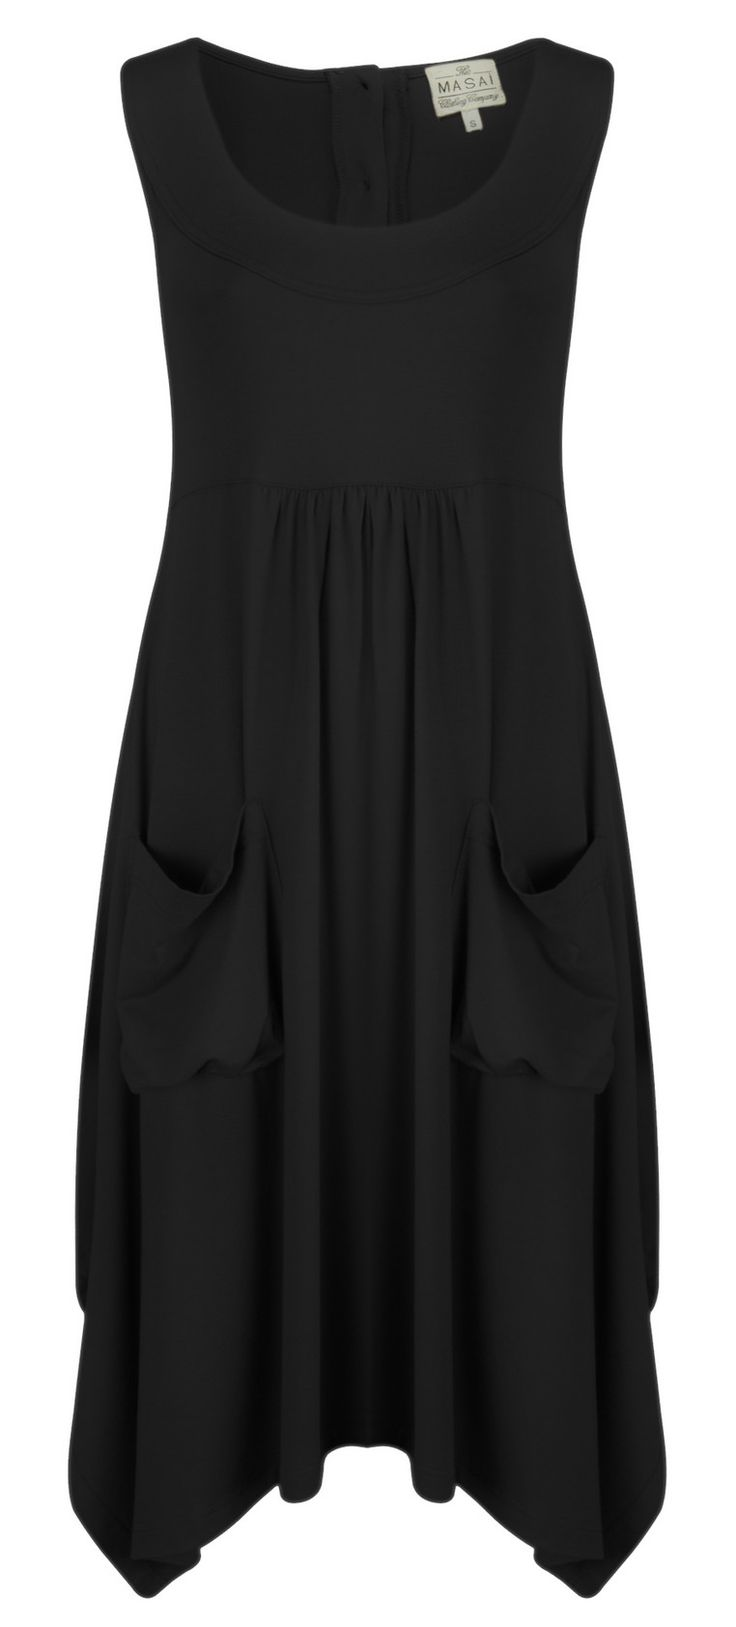 Masai Clothing Orinda Wide Bottom Dress (Black) at Gemini Woman- LOVE!                                                                                                                                                                                 More